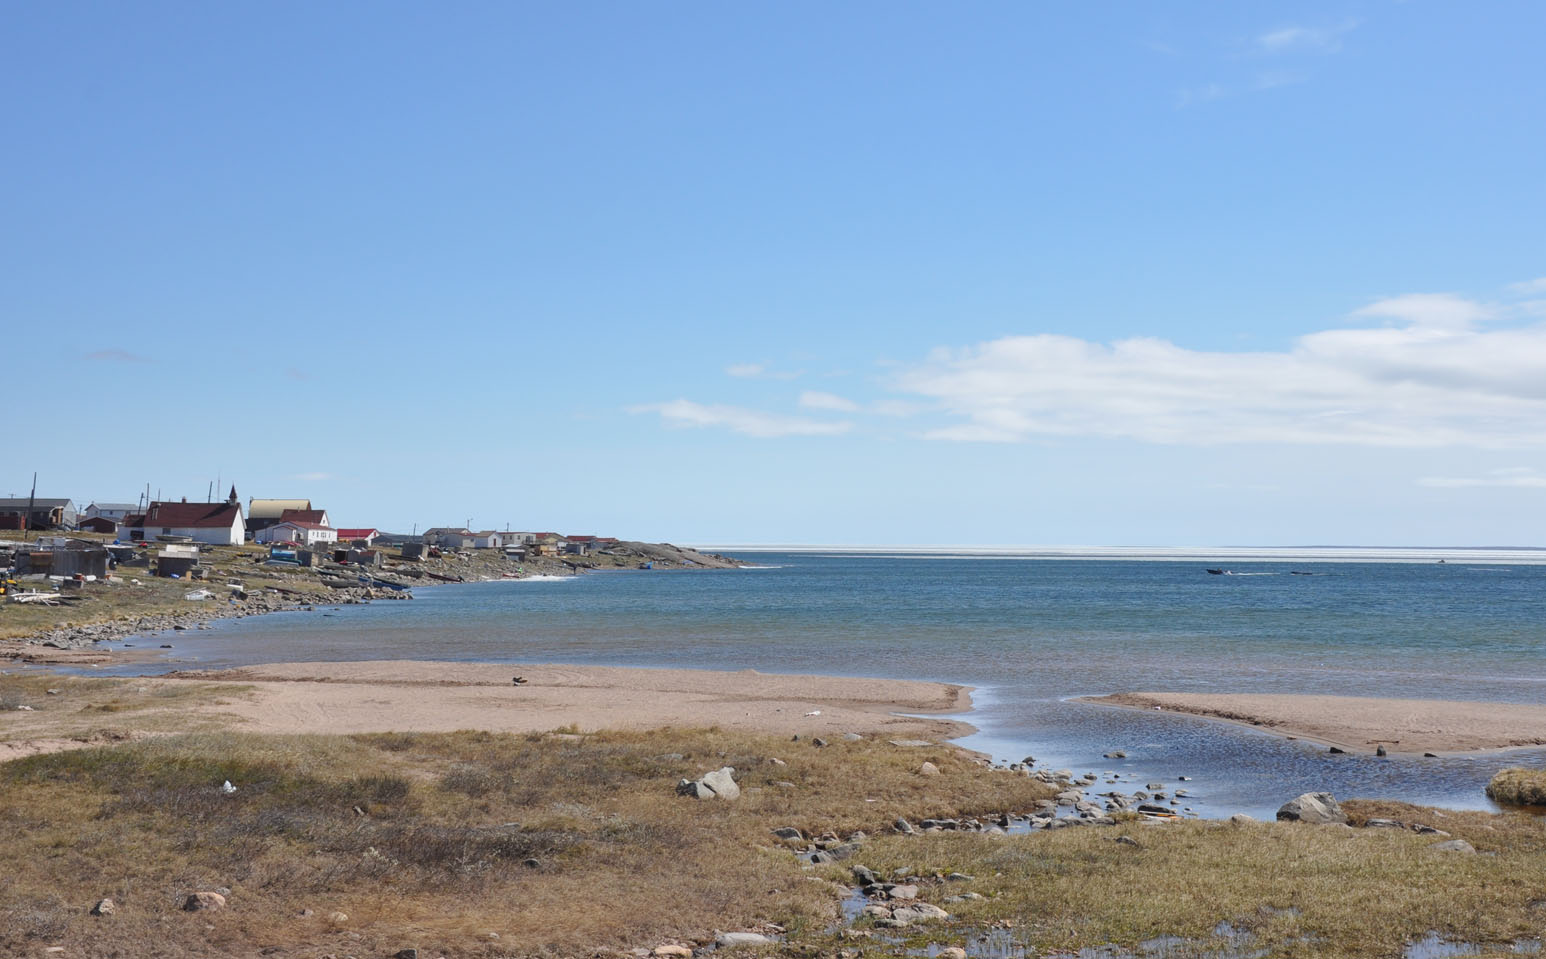 Sonar searchers find remains of missing Nunavut boater | Nunatsiaq News